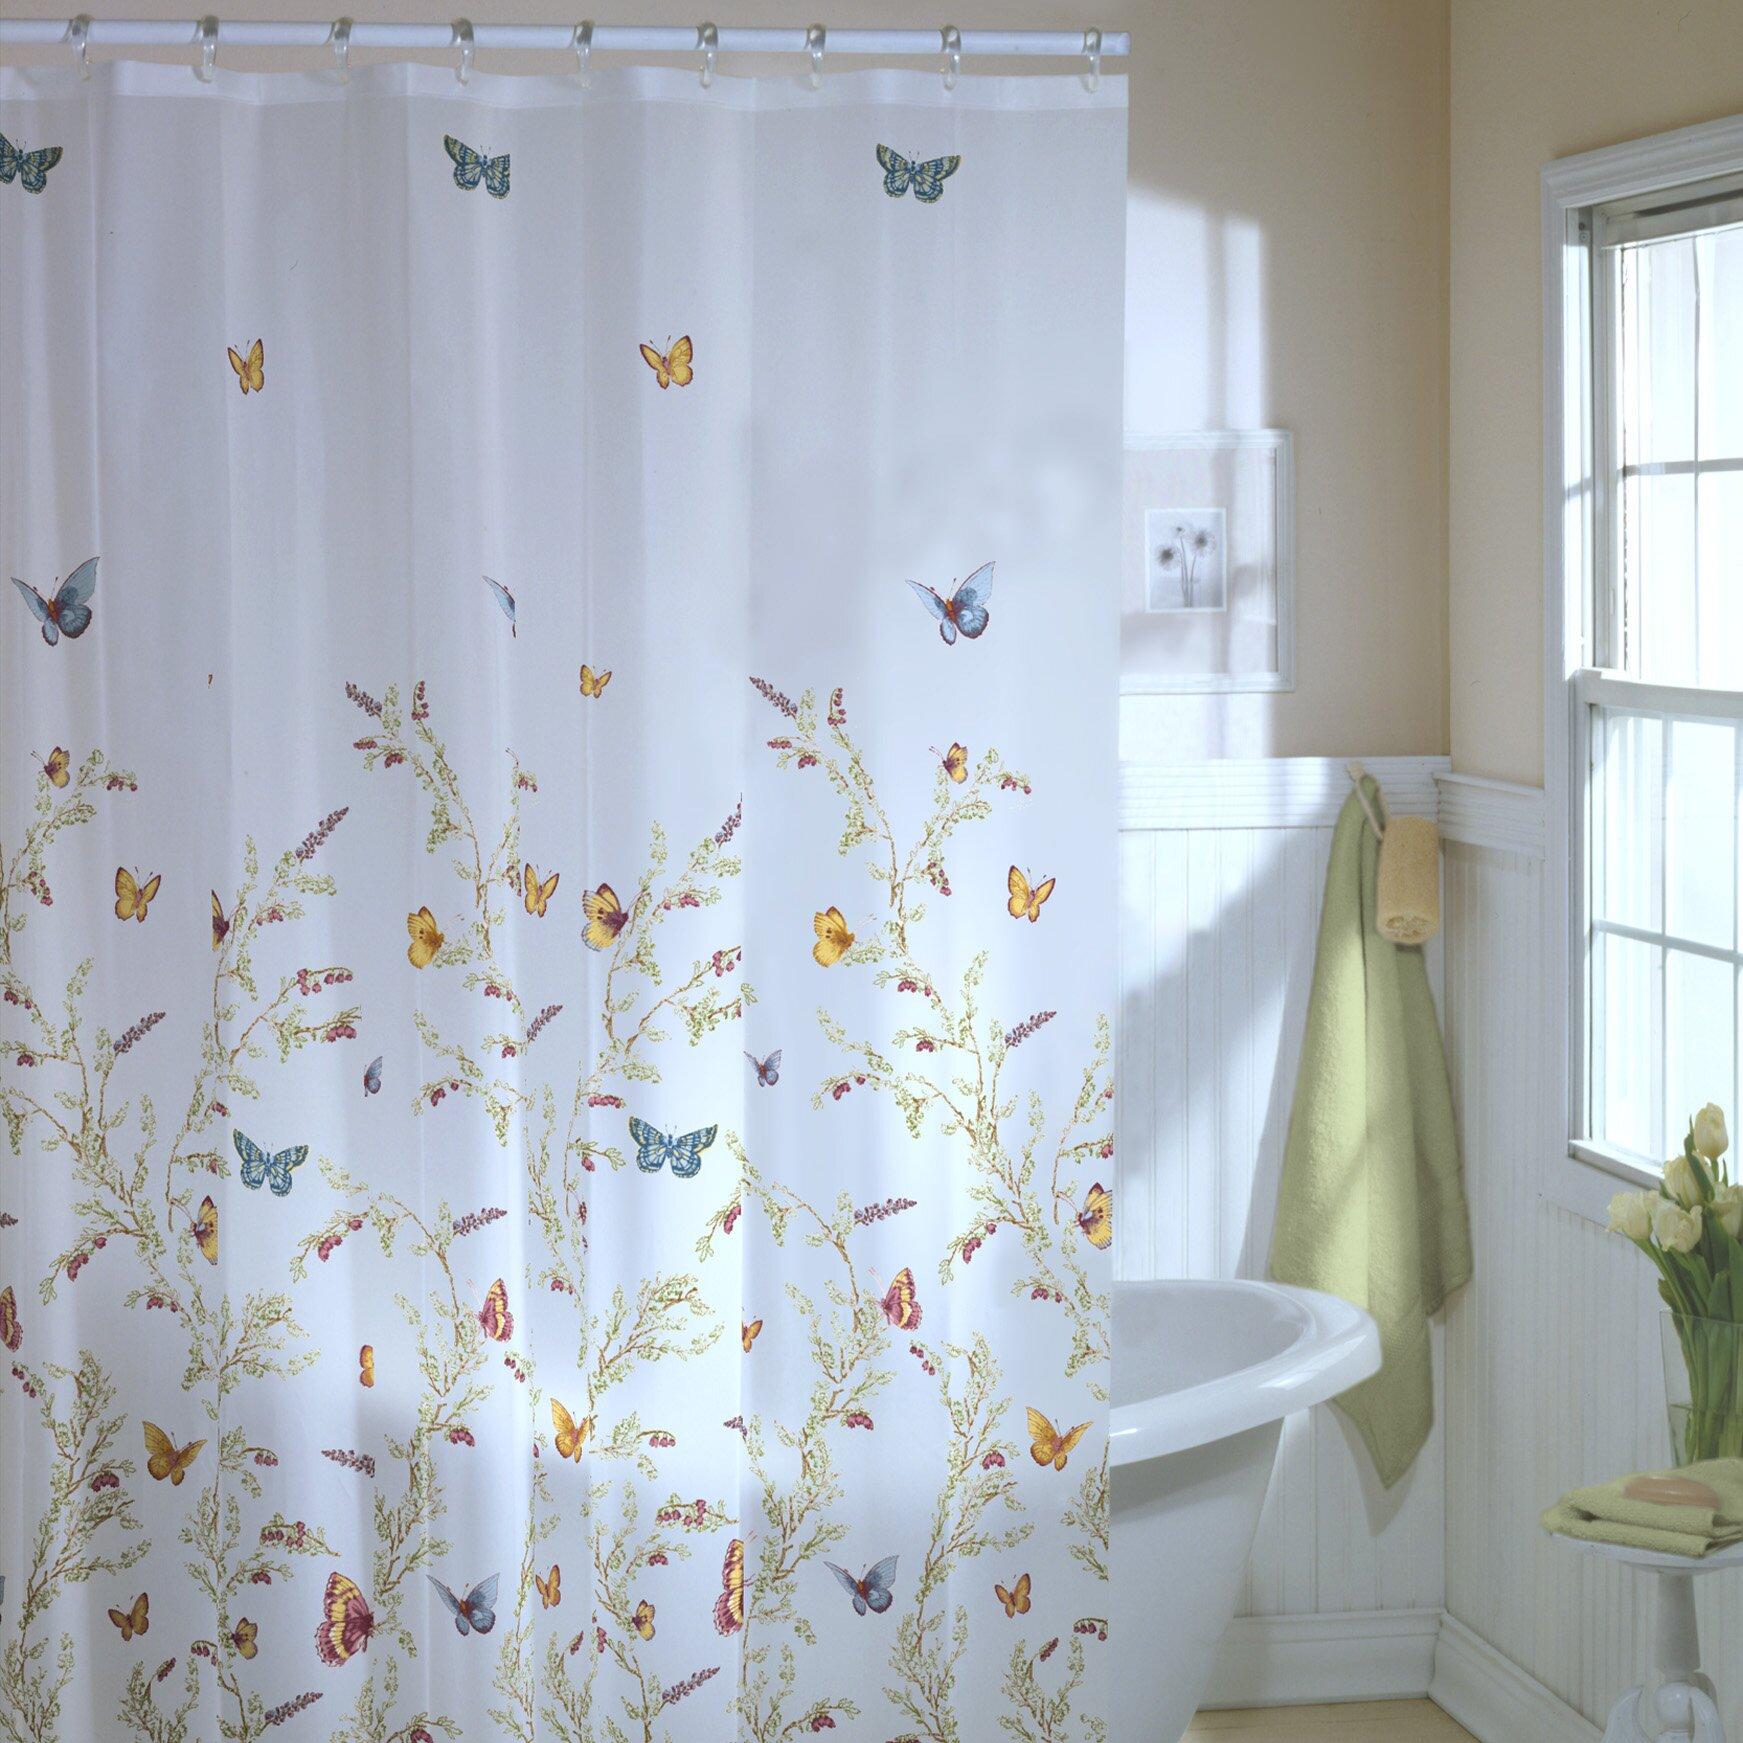 Flight Bathroom Door: August Grove Ramona Garden Flight Shower Curtain & Reviews